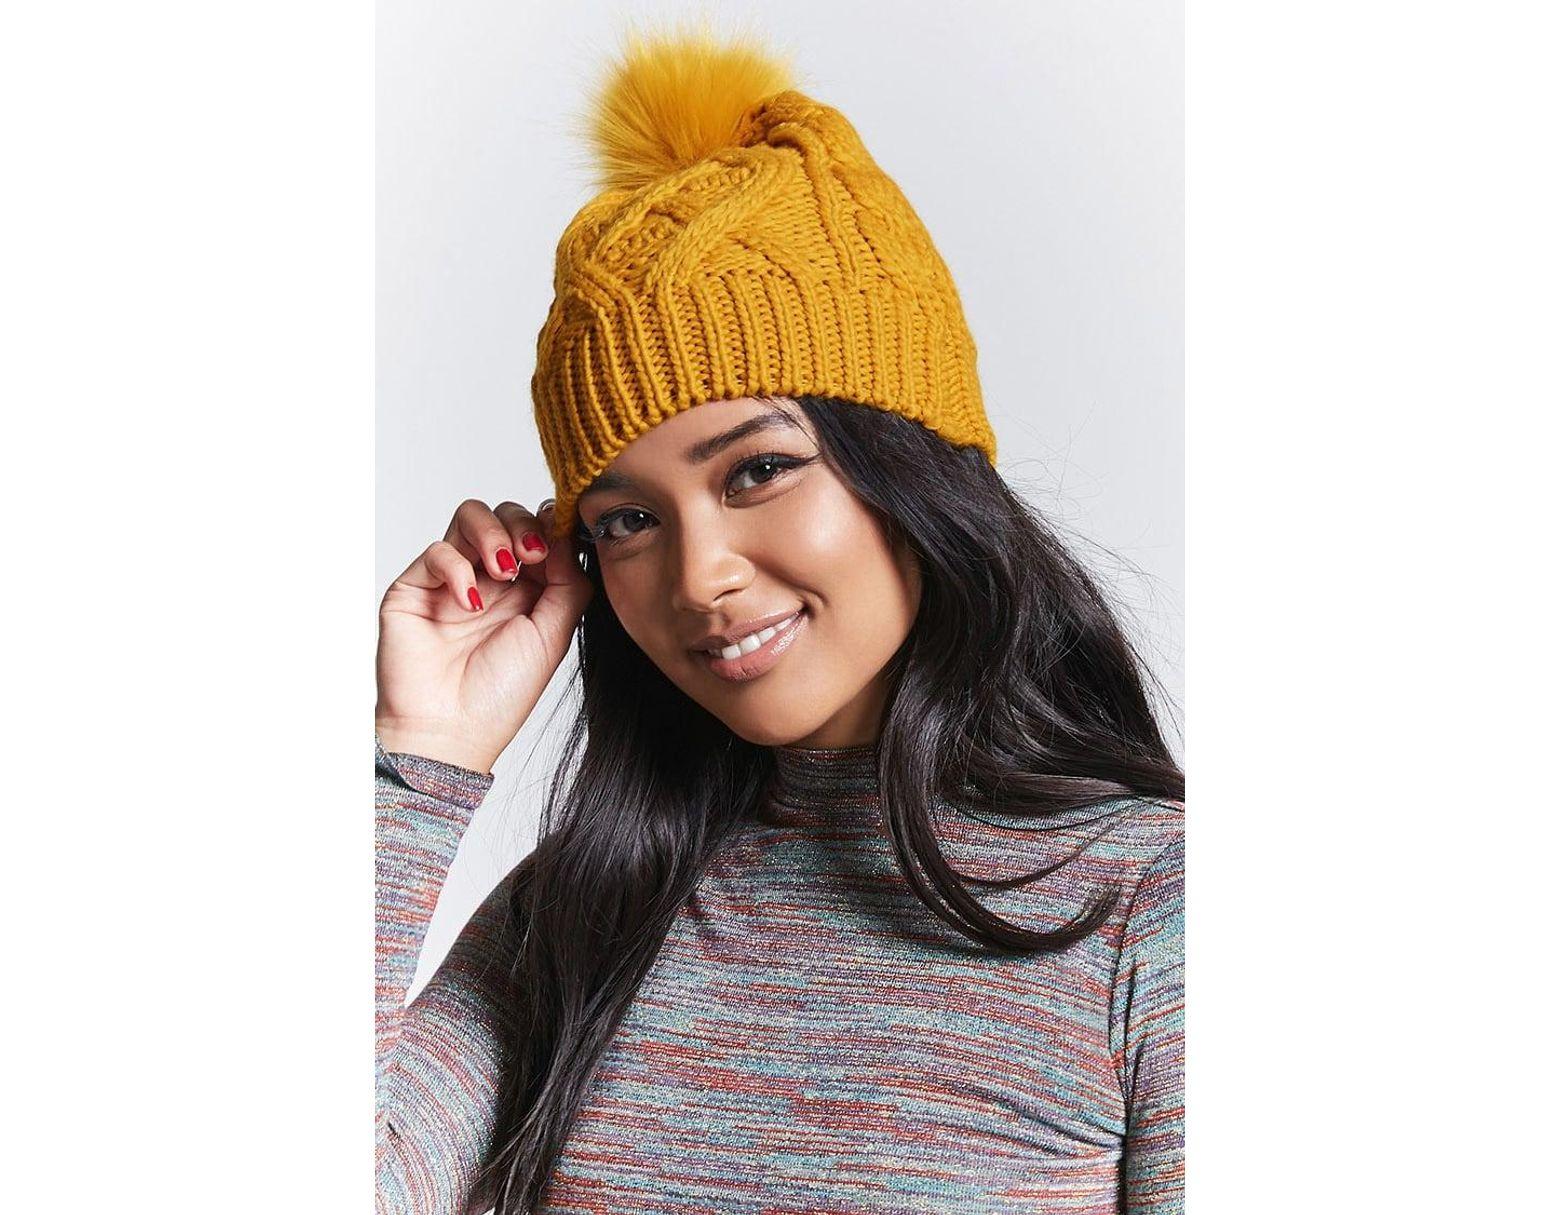 79c4e2794 Women's Cable Knit Pom Pom Beanie , Mustard